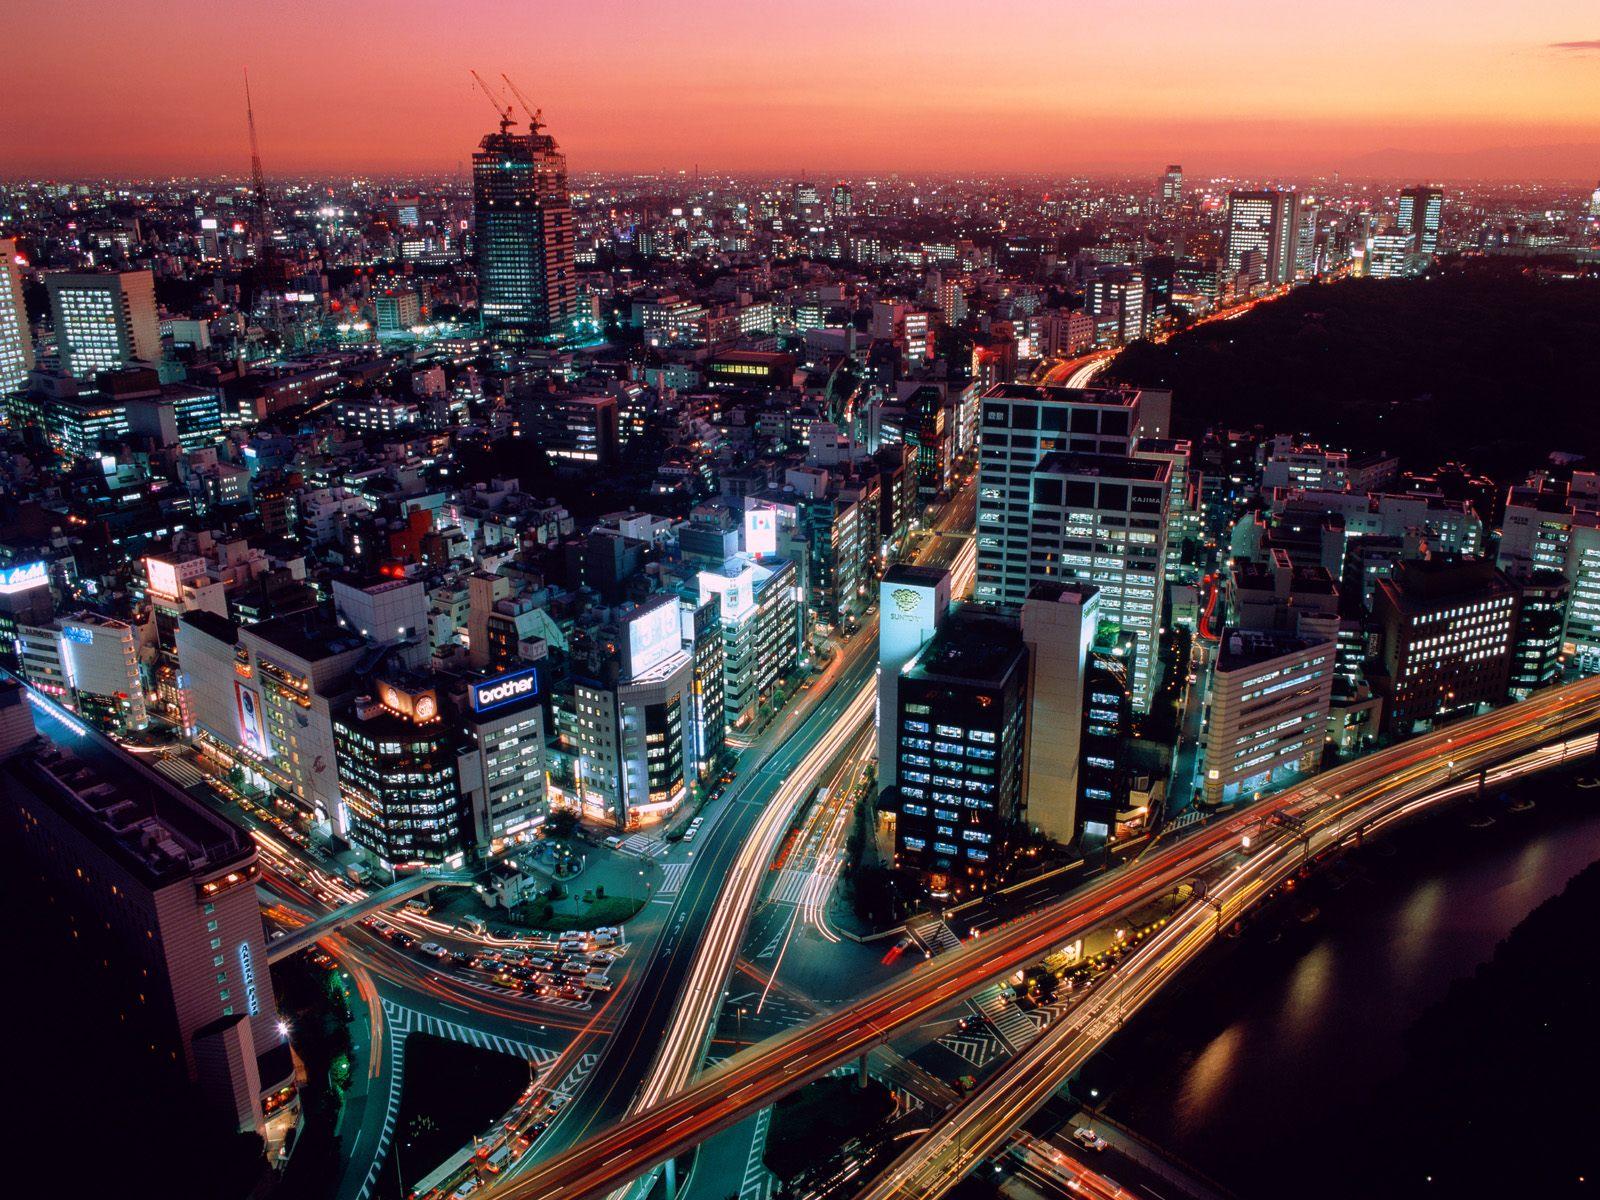 http://www.csuci.edu/cia/countries/images/tokyo-japan.jpg